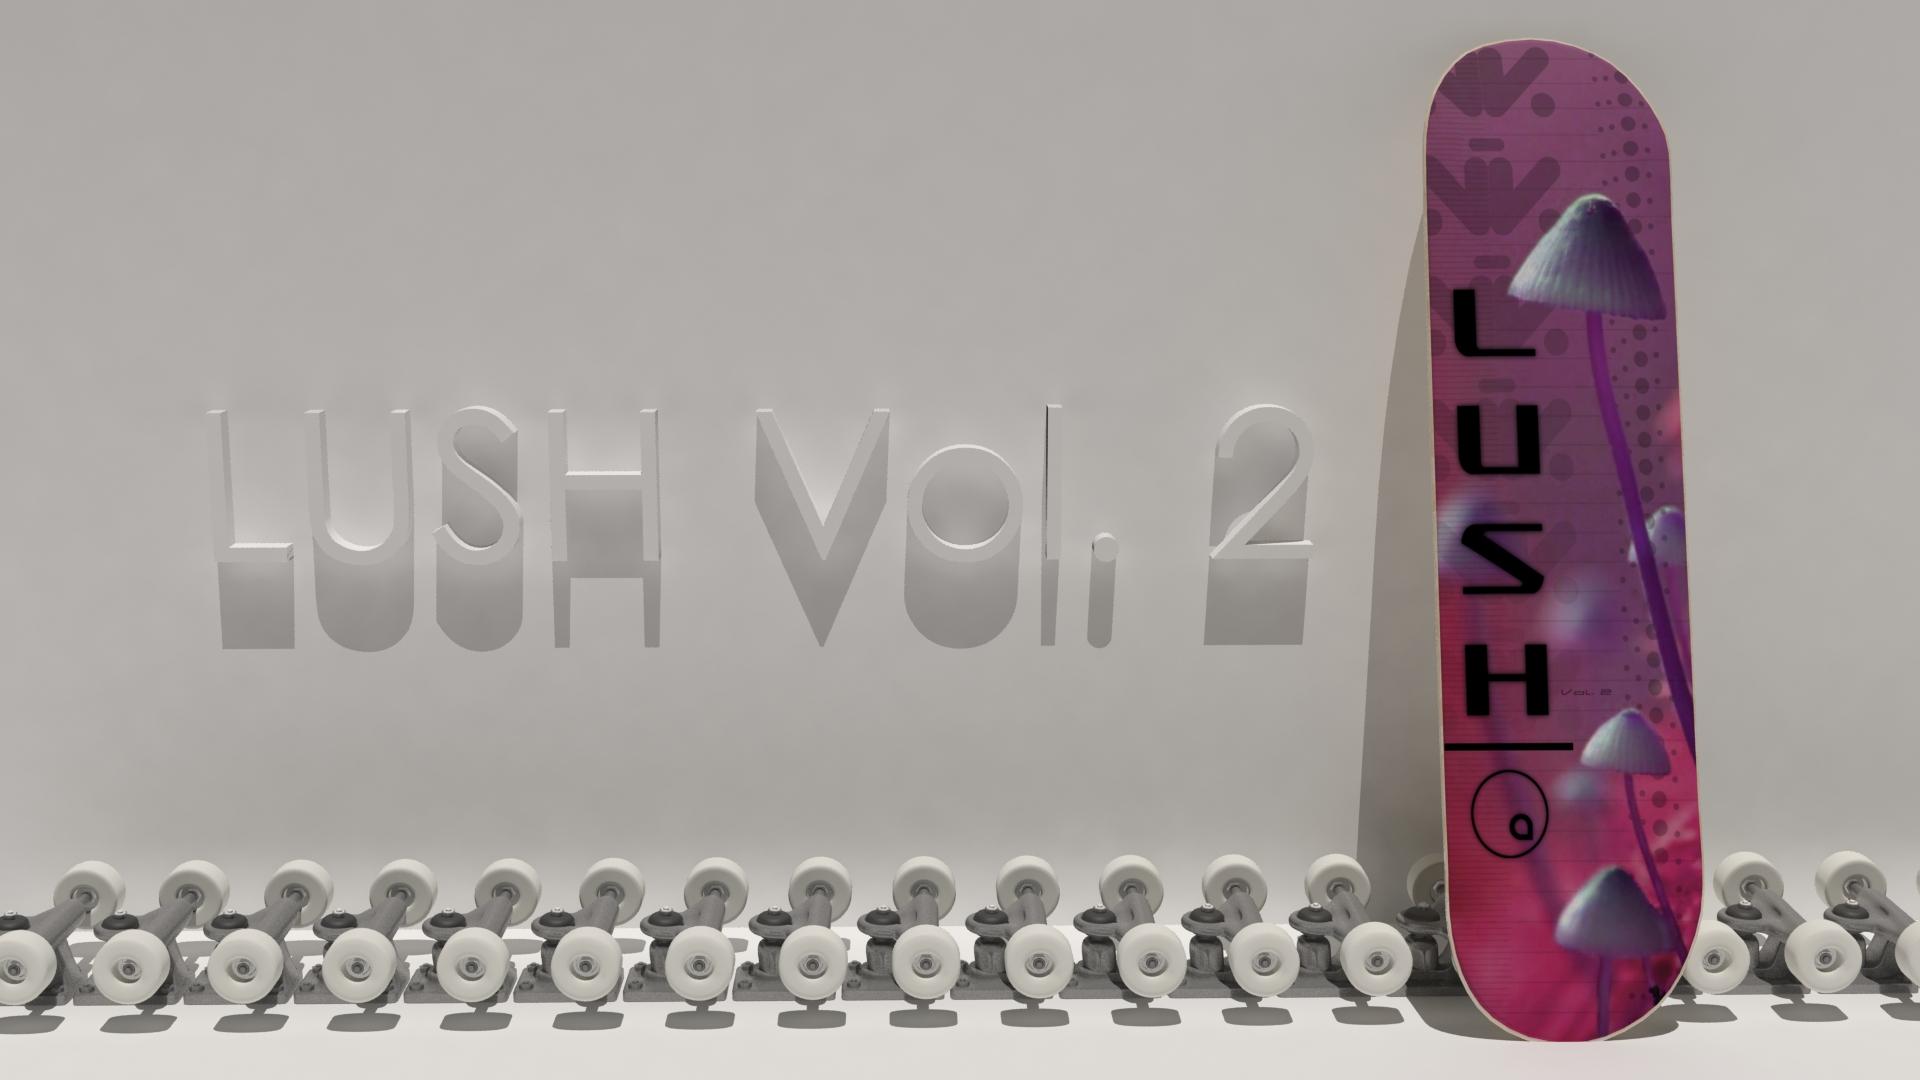 Lush Vol. 2